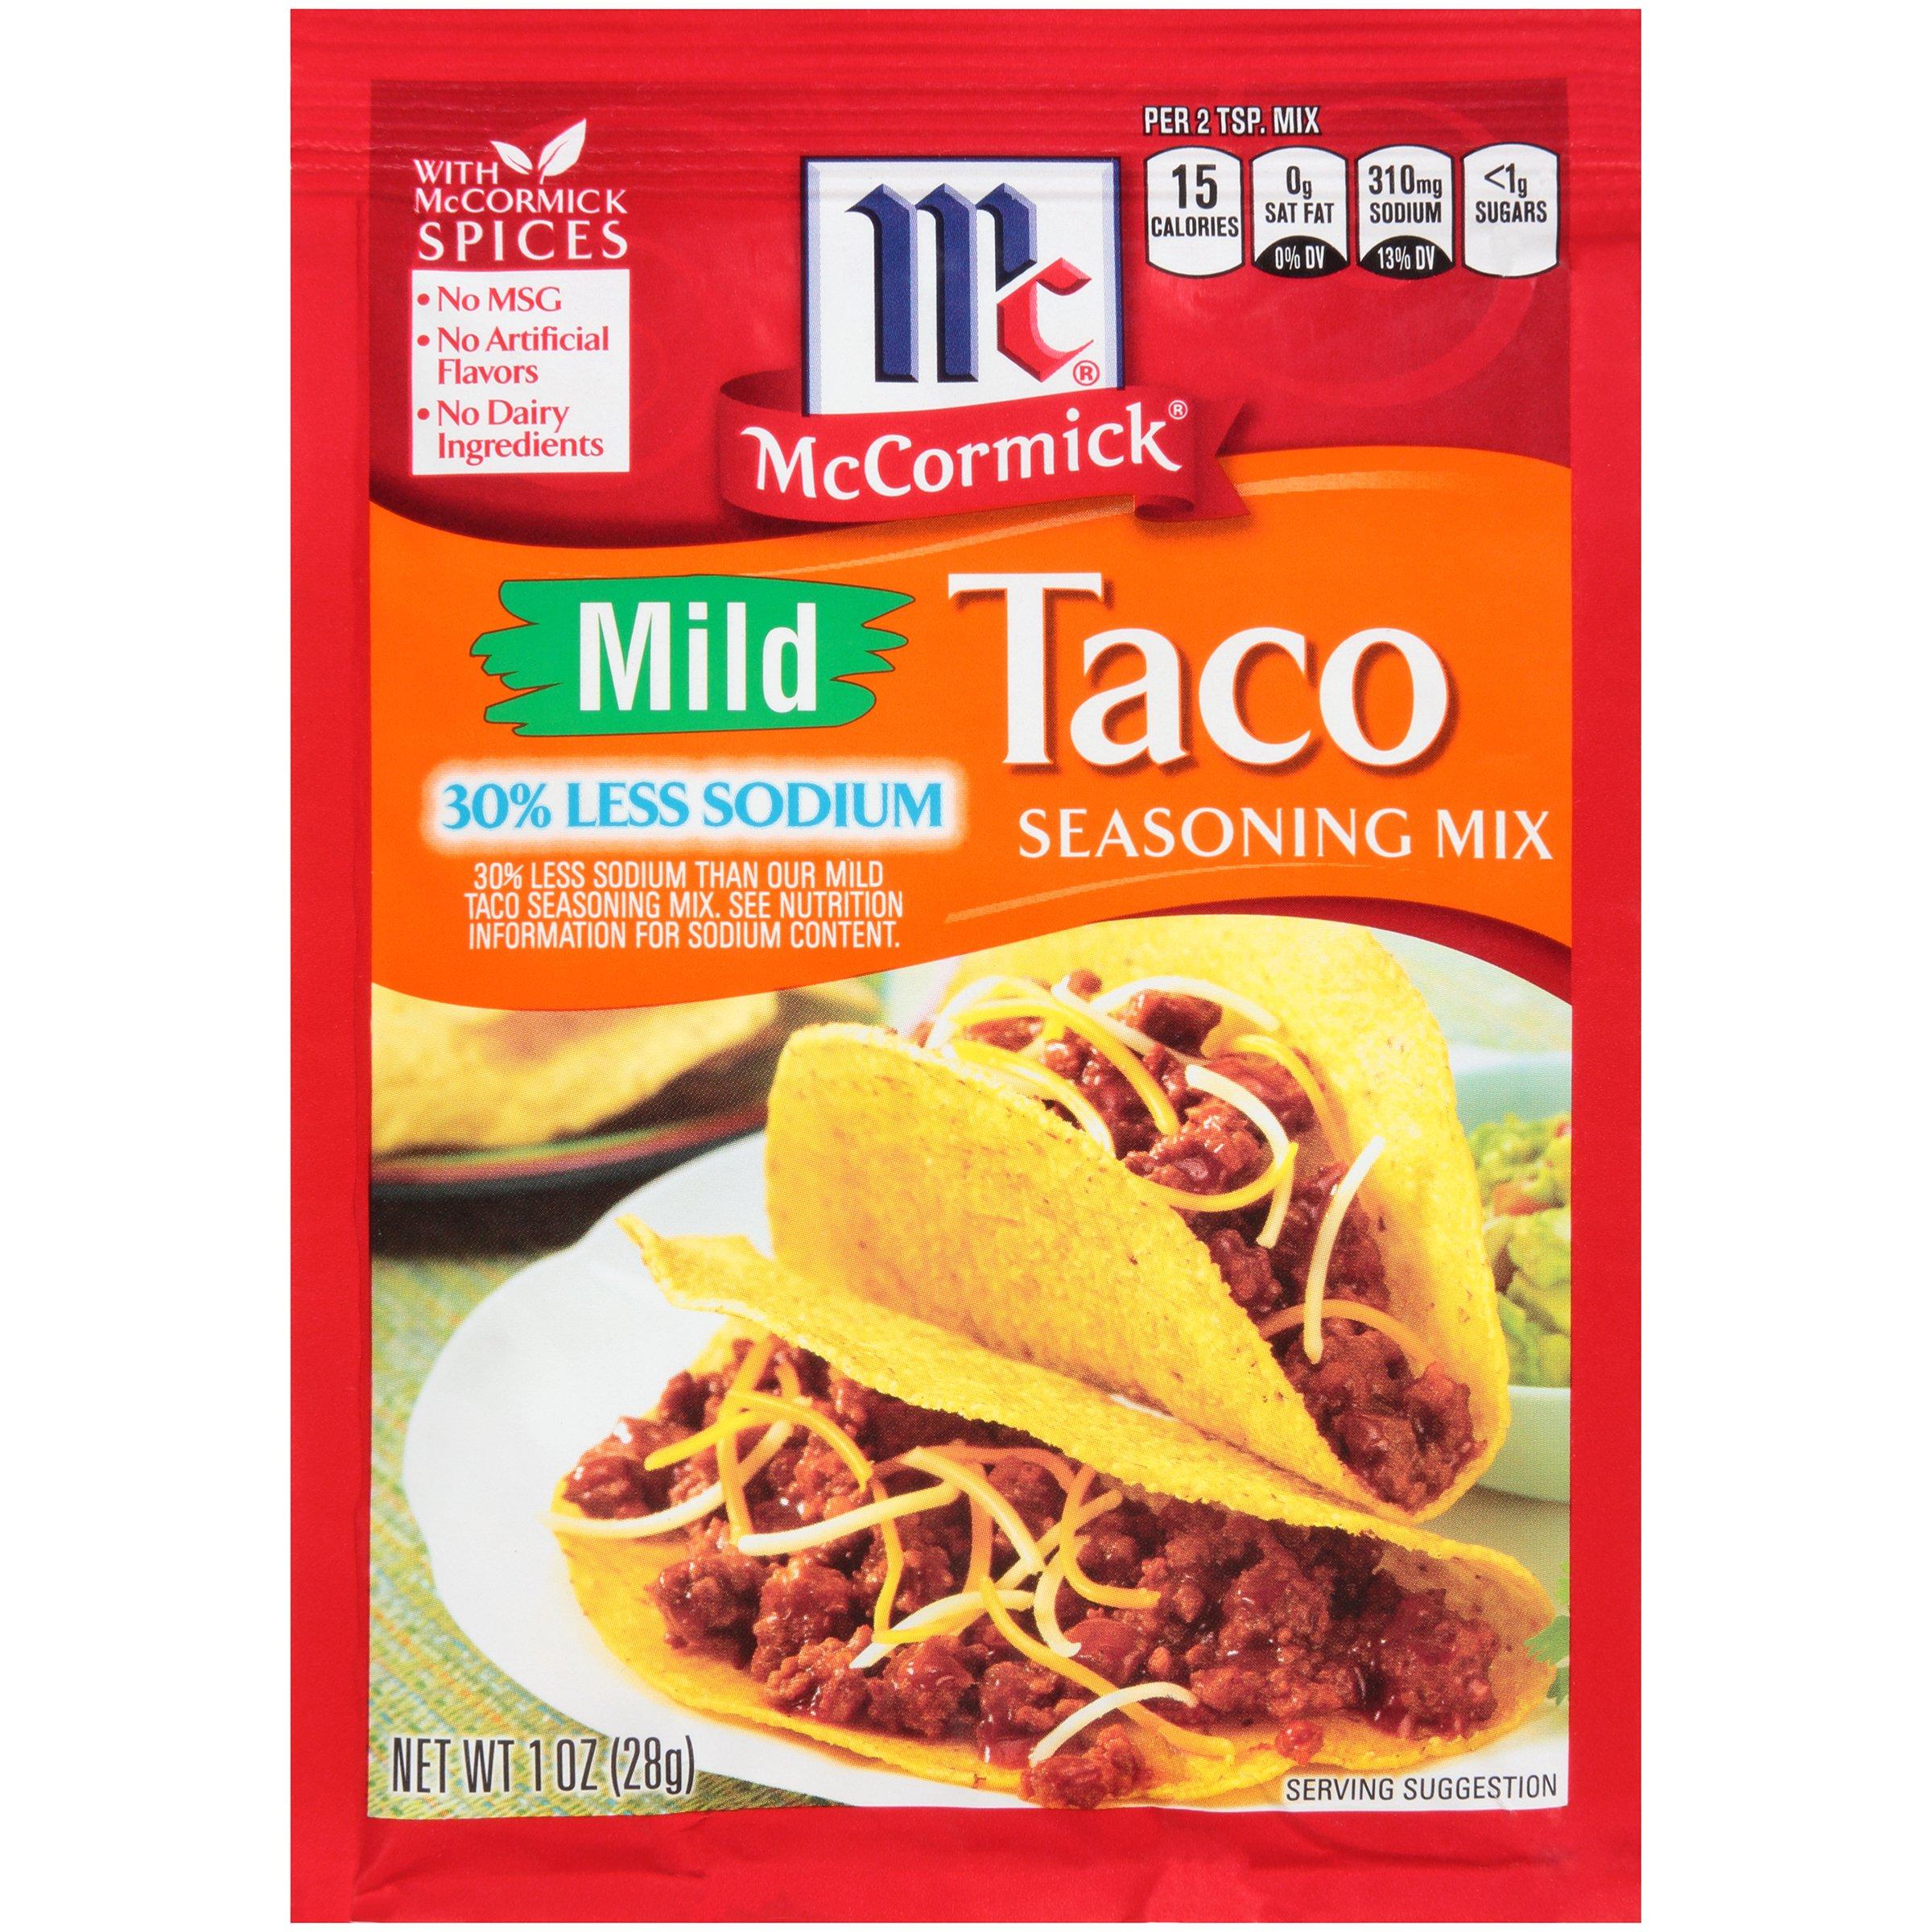 McCormick 30% Less Sodium Mild Taco Seasoning Mix, 1 oz by McCormick (Image #1)